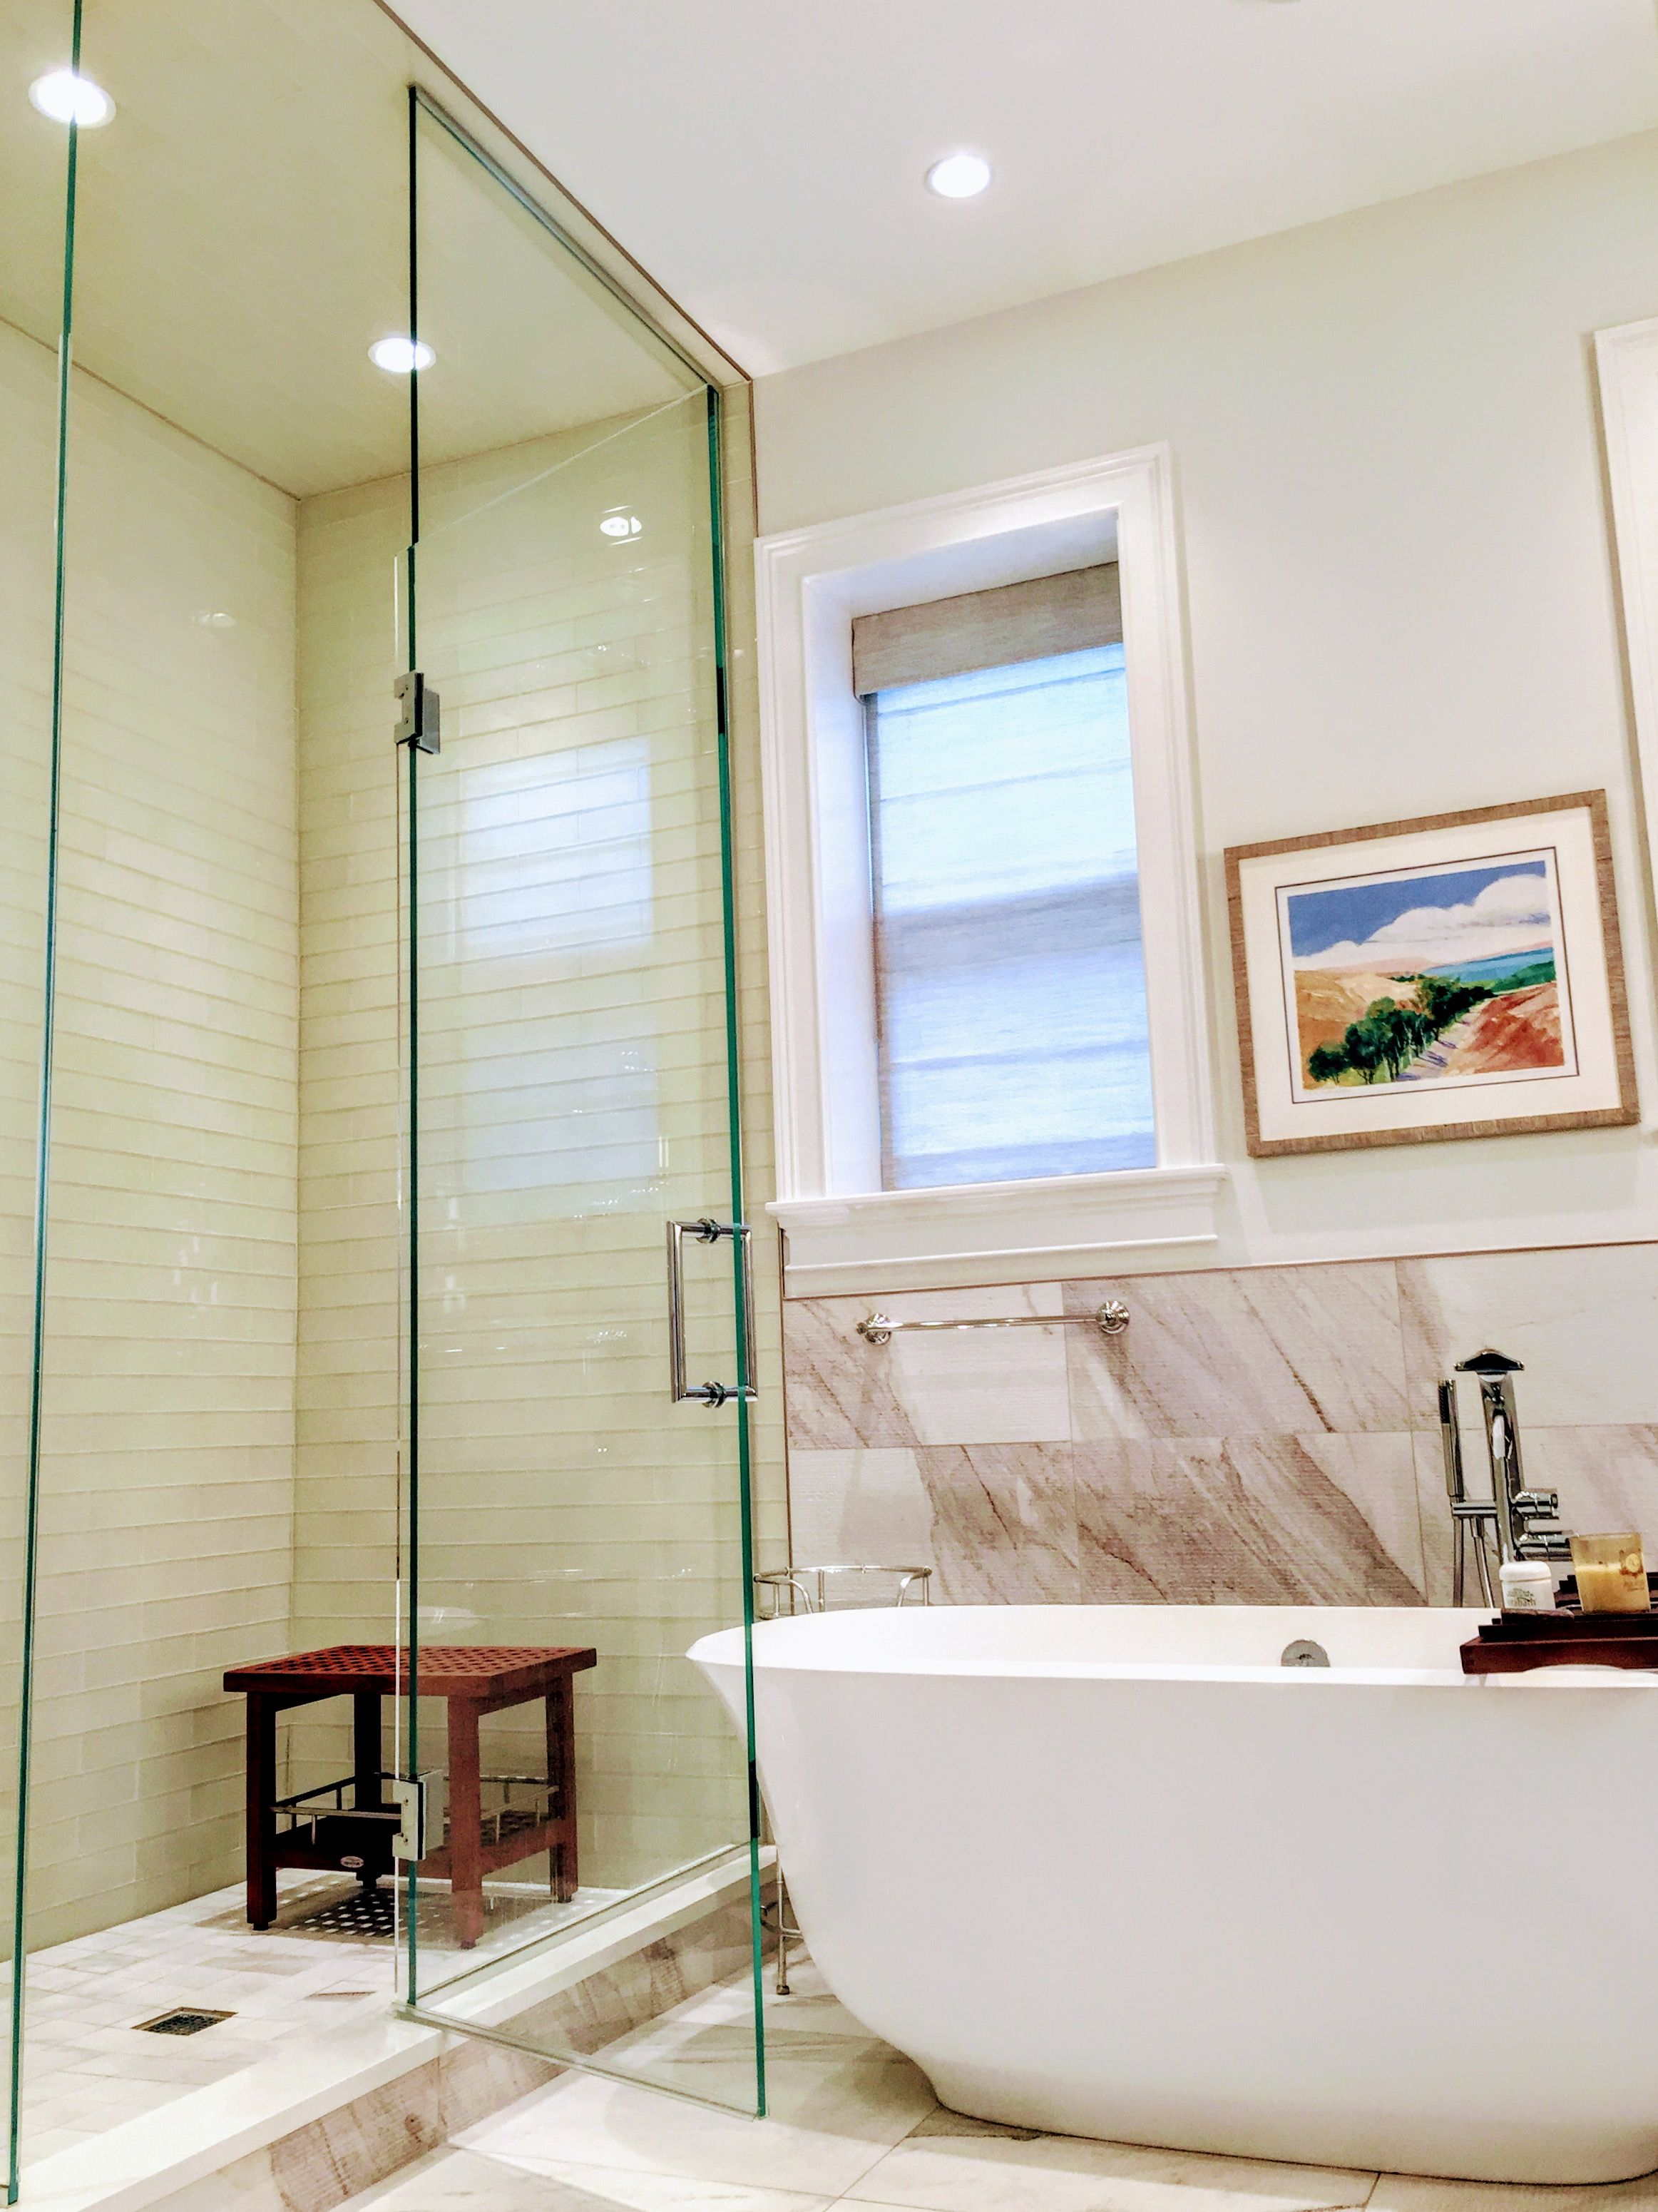 Beautiful Bathroom Design For A Remodeled Home In Chicago 12 Stunning Bathroom Designer Chicago Decorating Design